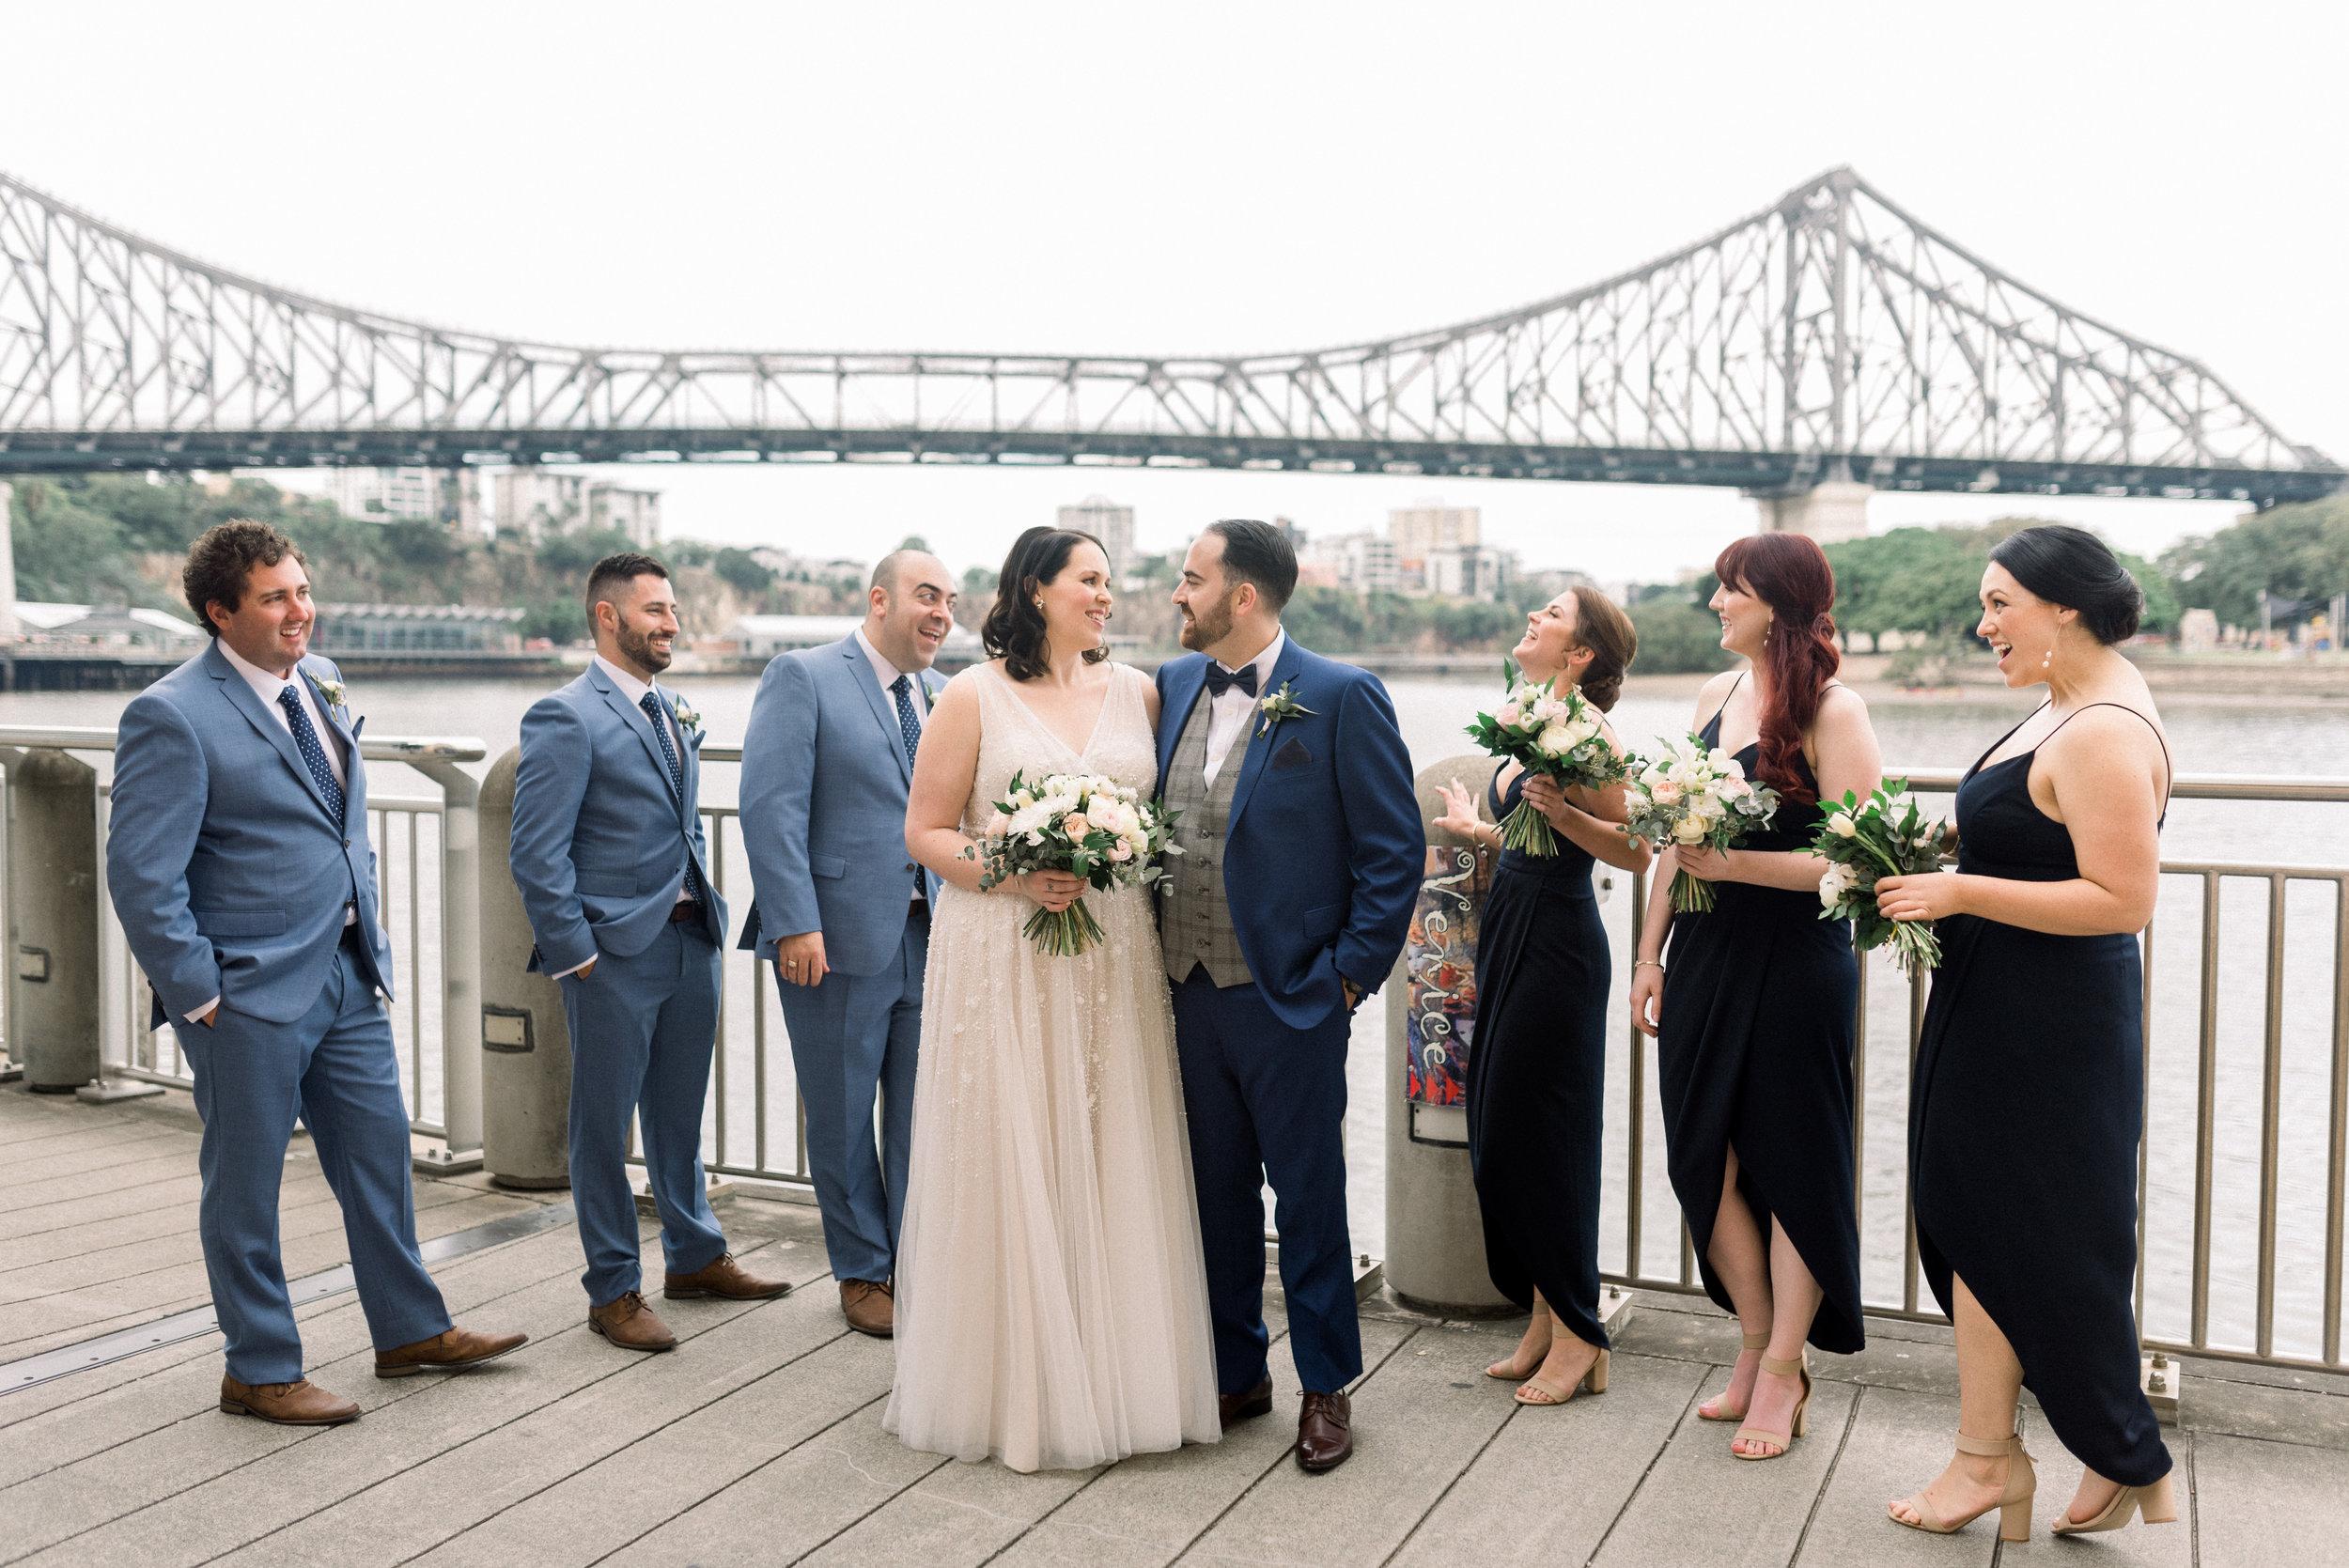 brisbane-city-wedding-photographer-romantic-wedding-58.jpg